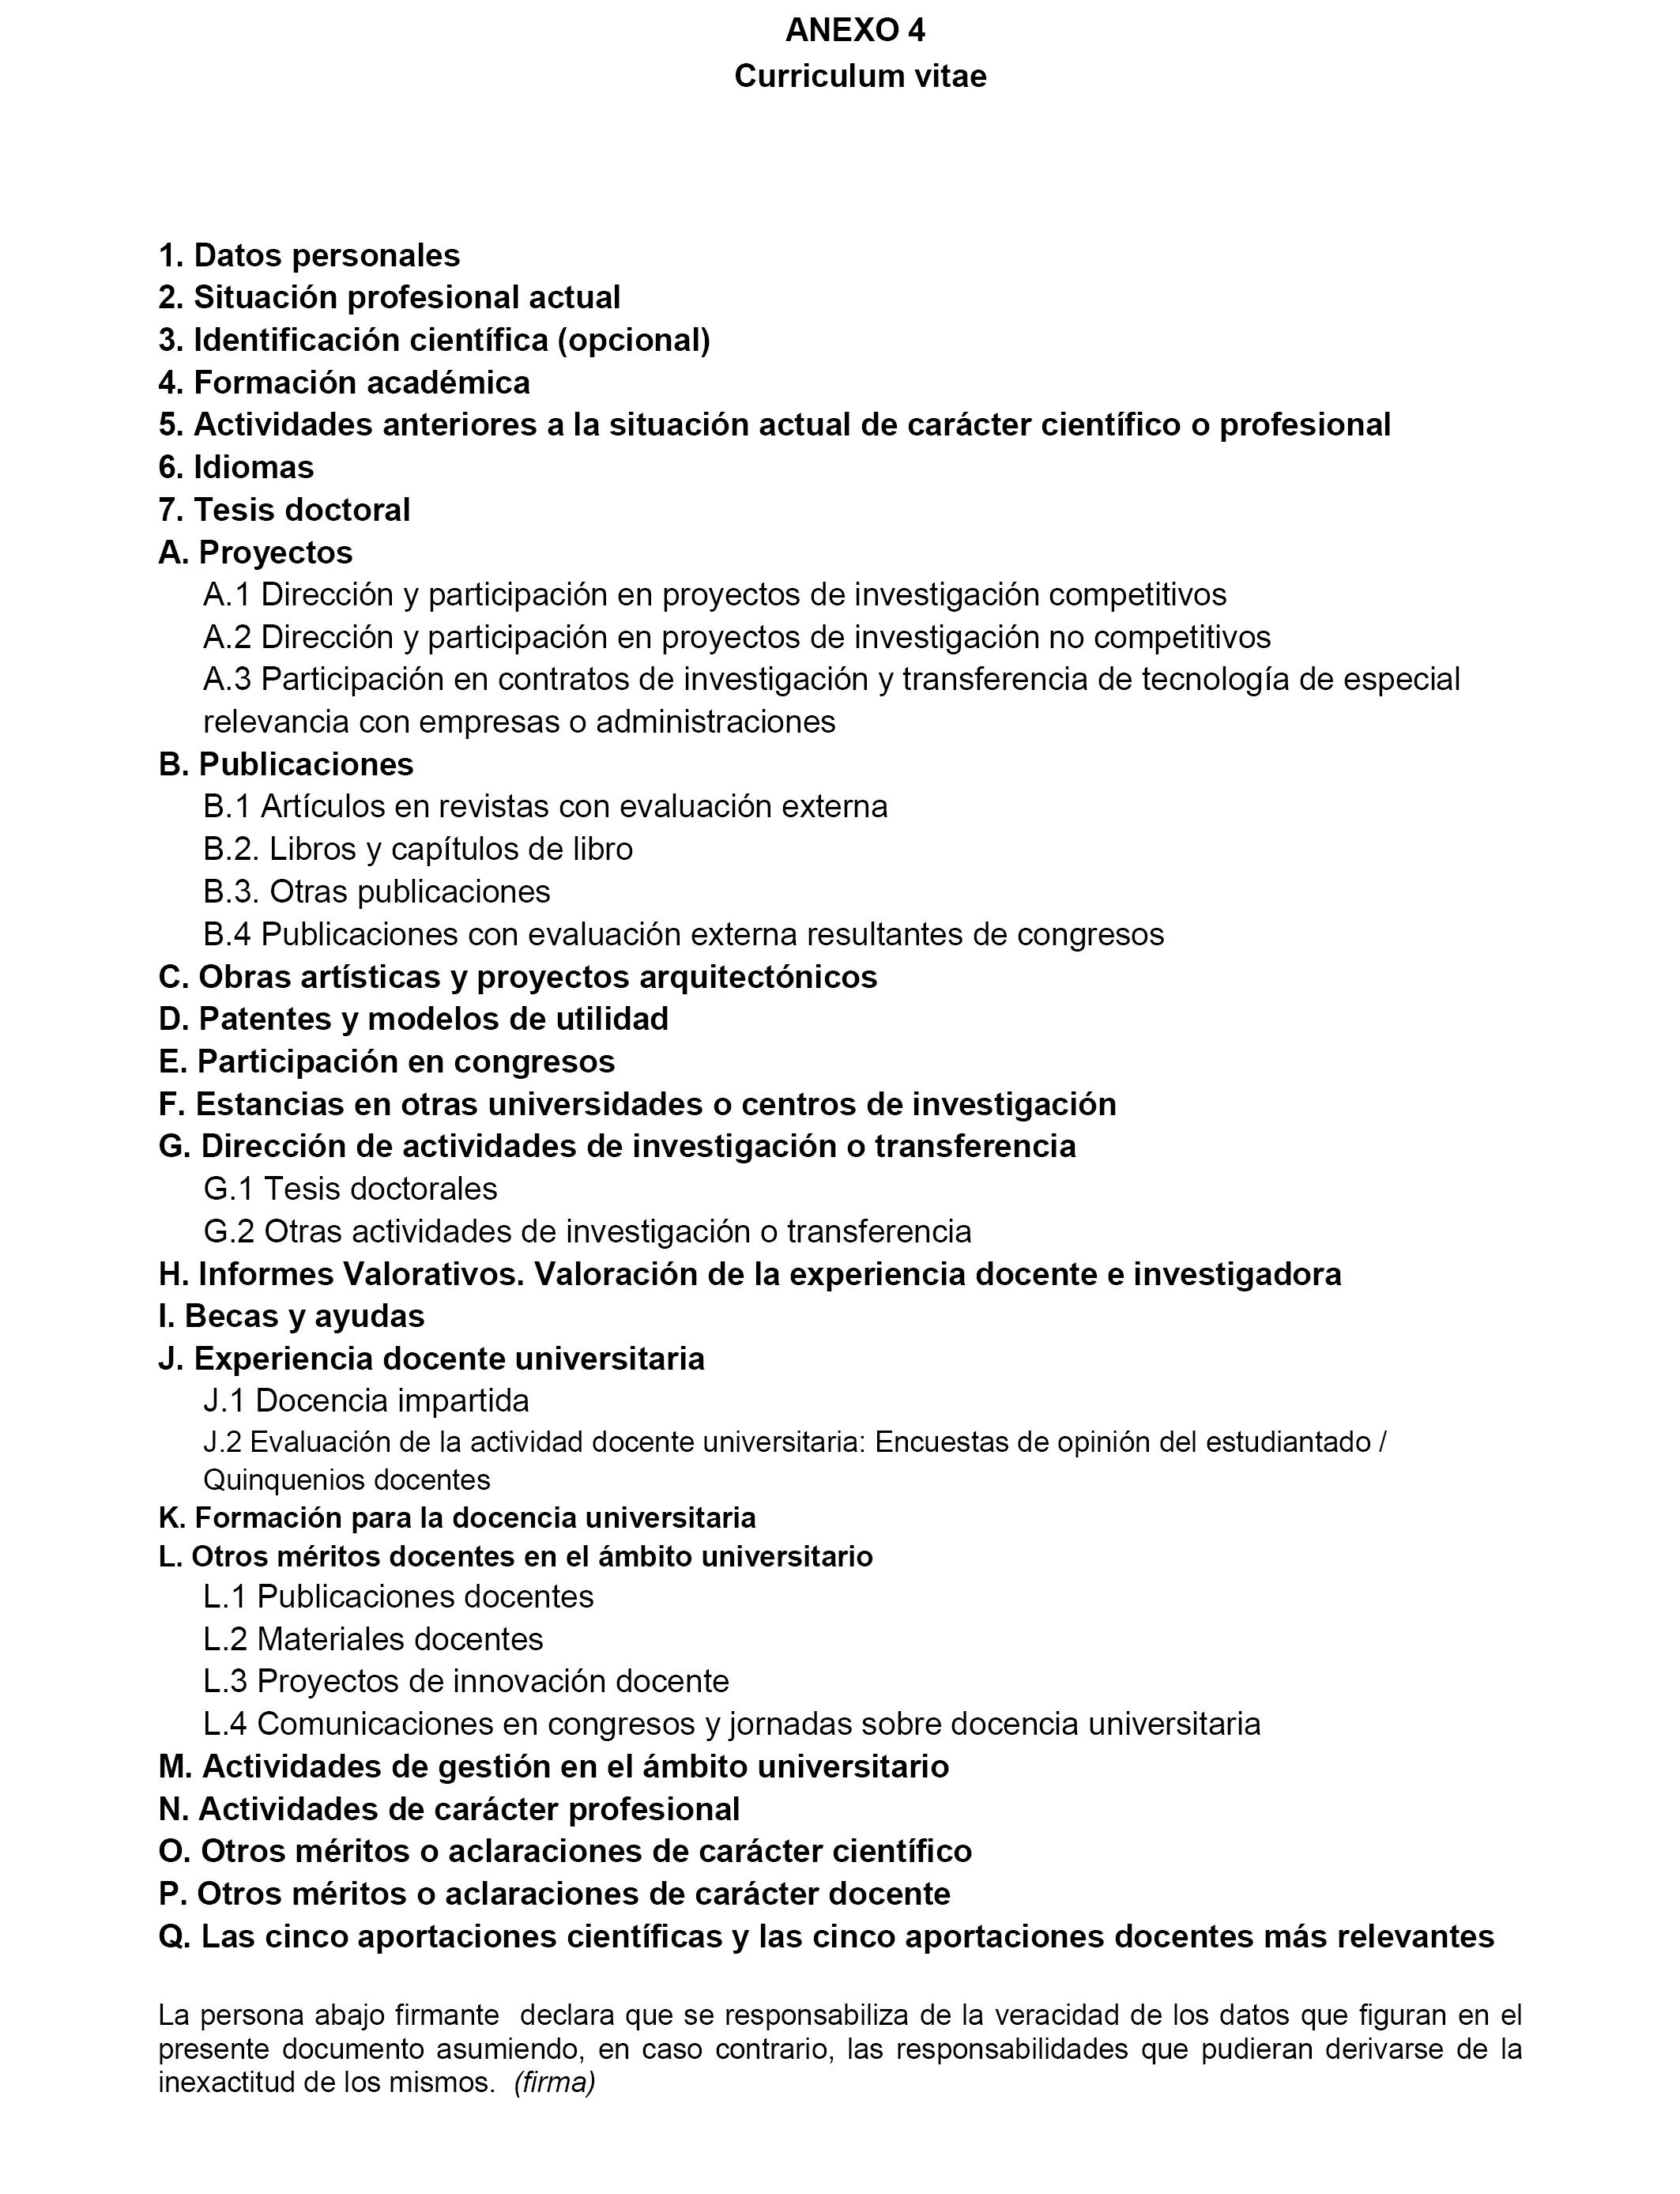 BOE.es - Documento BOE-A-2017-2934